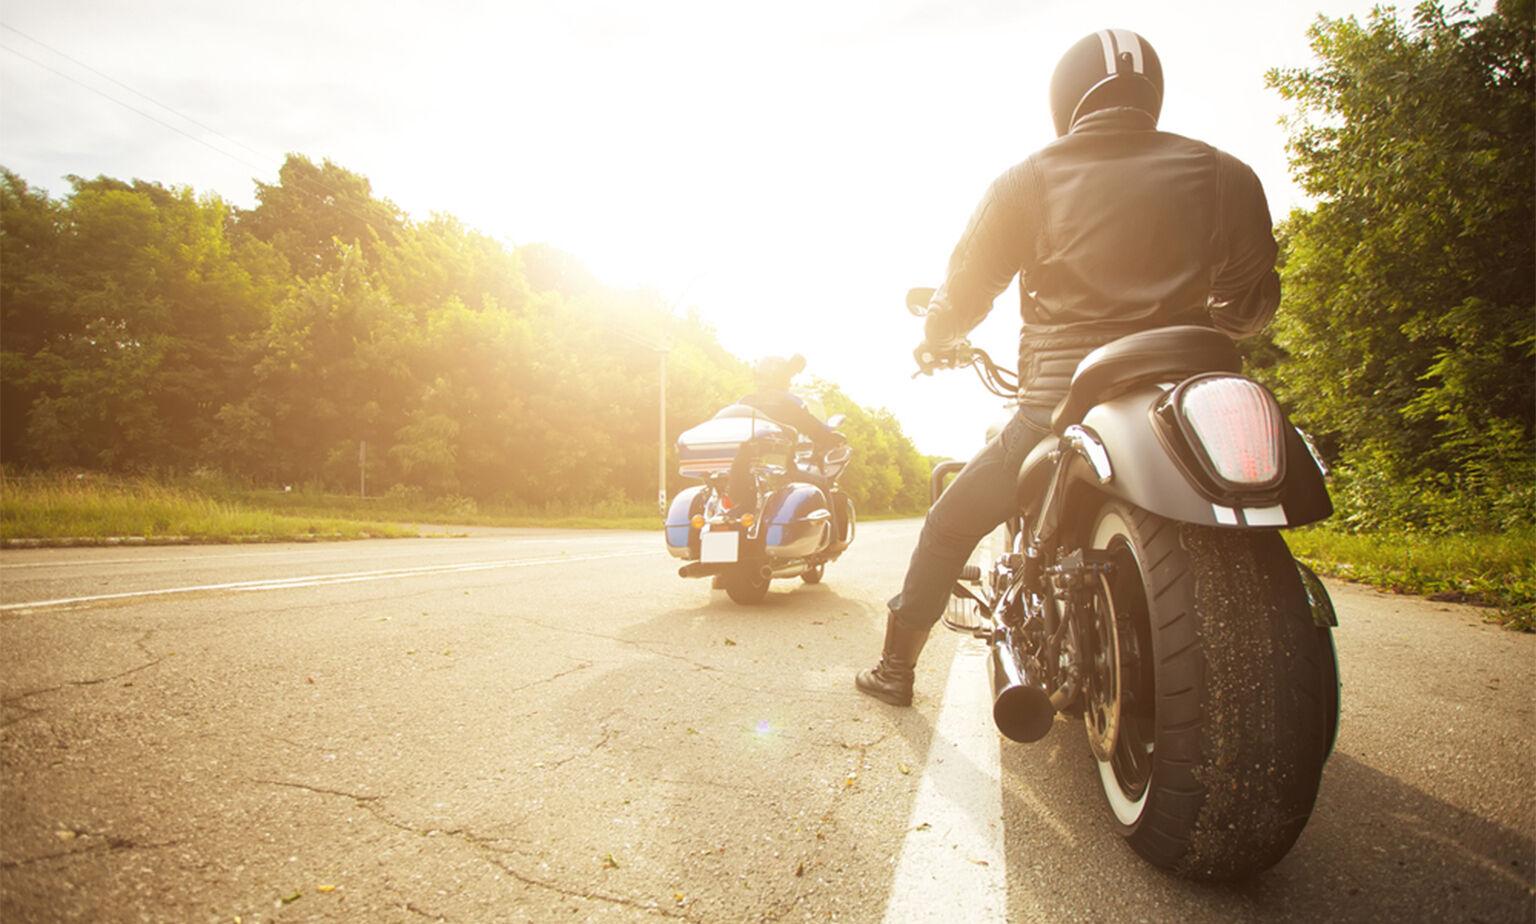 Shop Best of Motorcycles